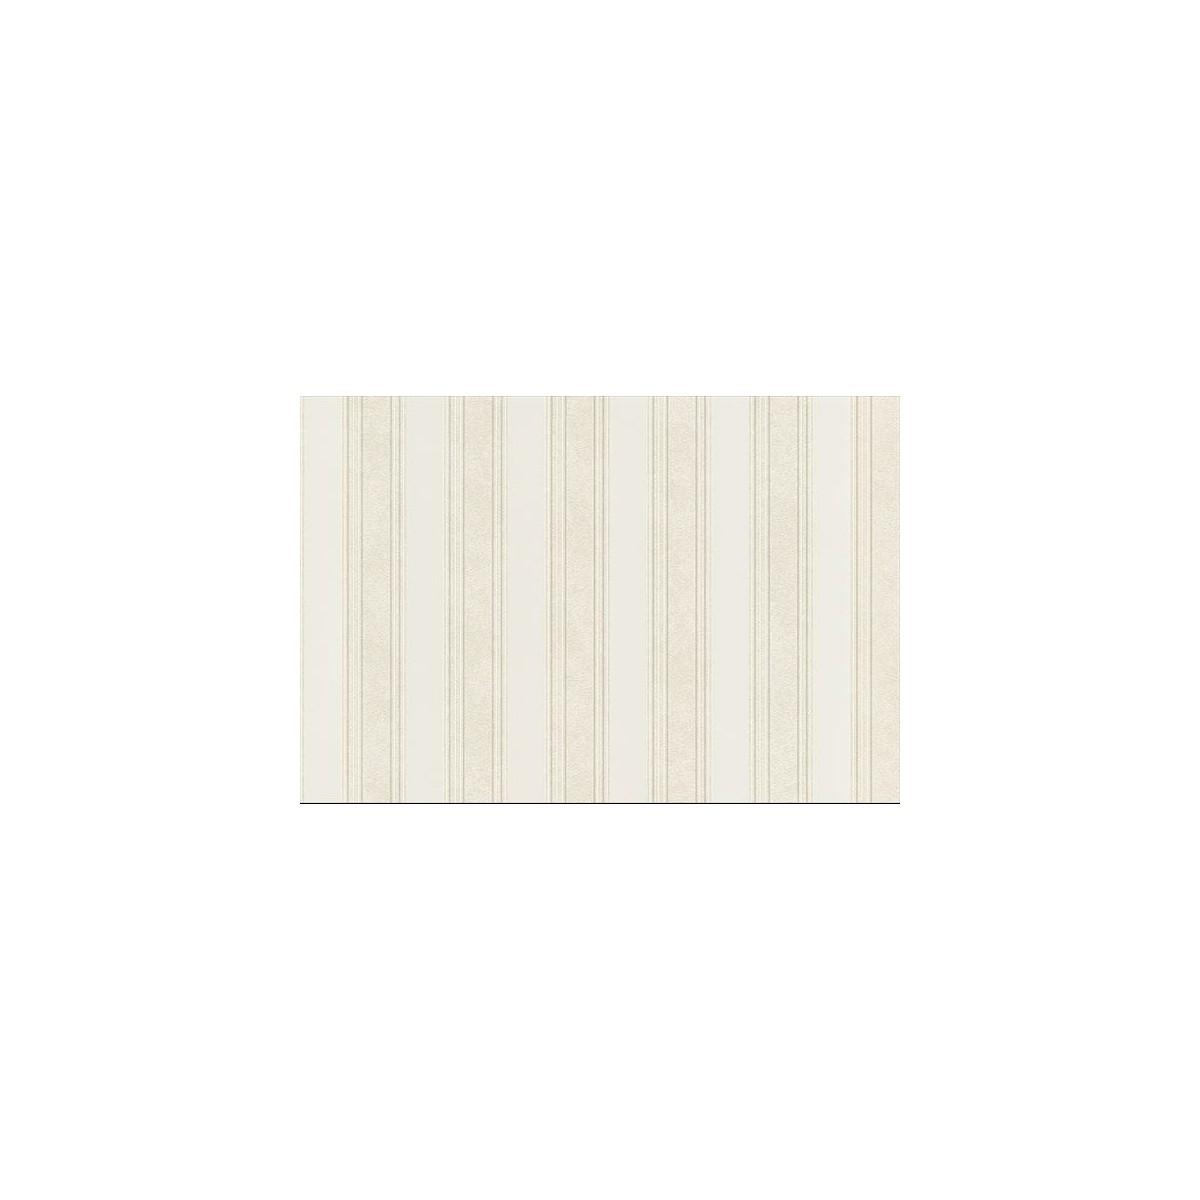 Shop By Style Stripe Creamy Barocco Cream Large Stripe Wallpaper 1200x1200